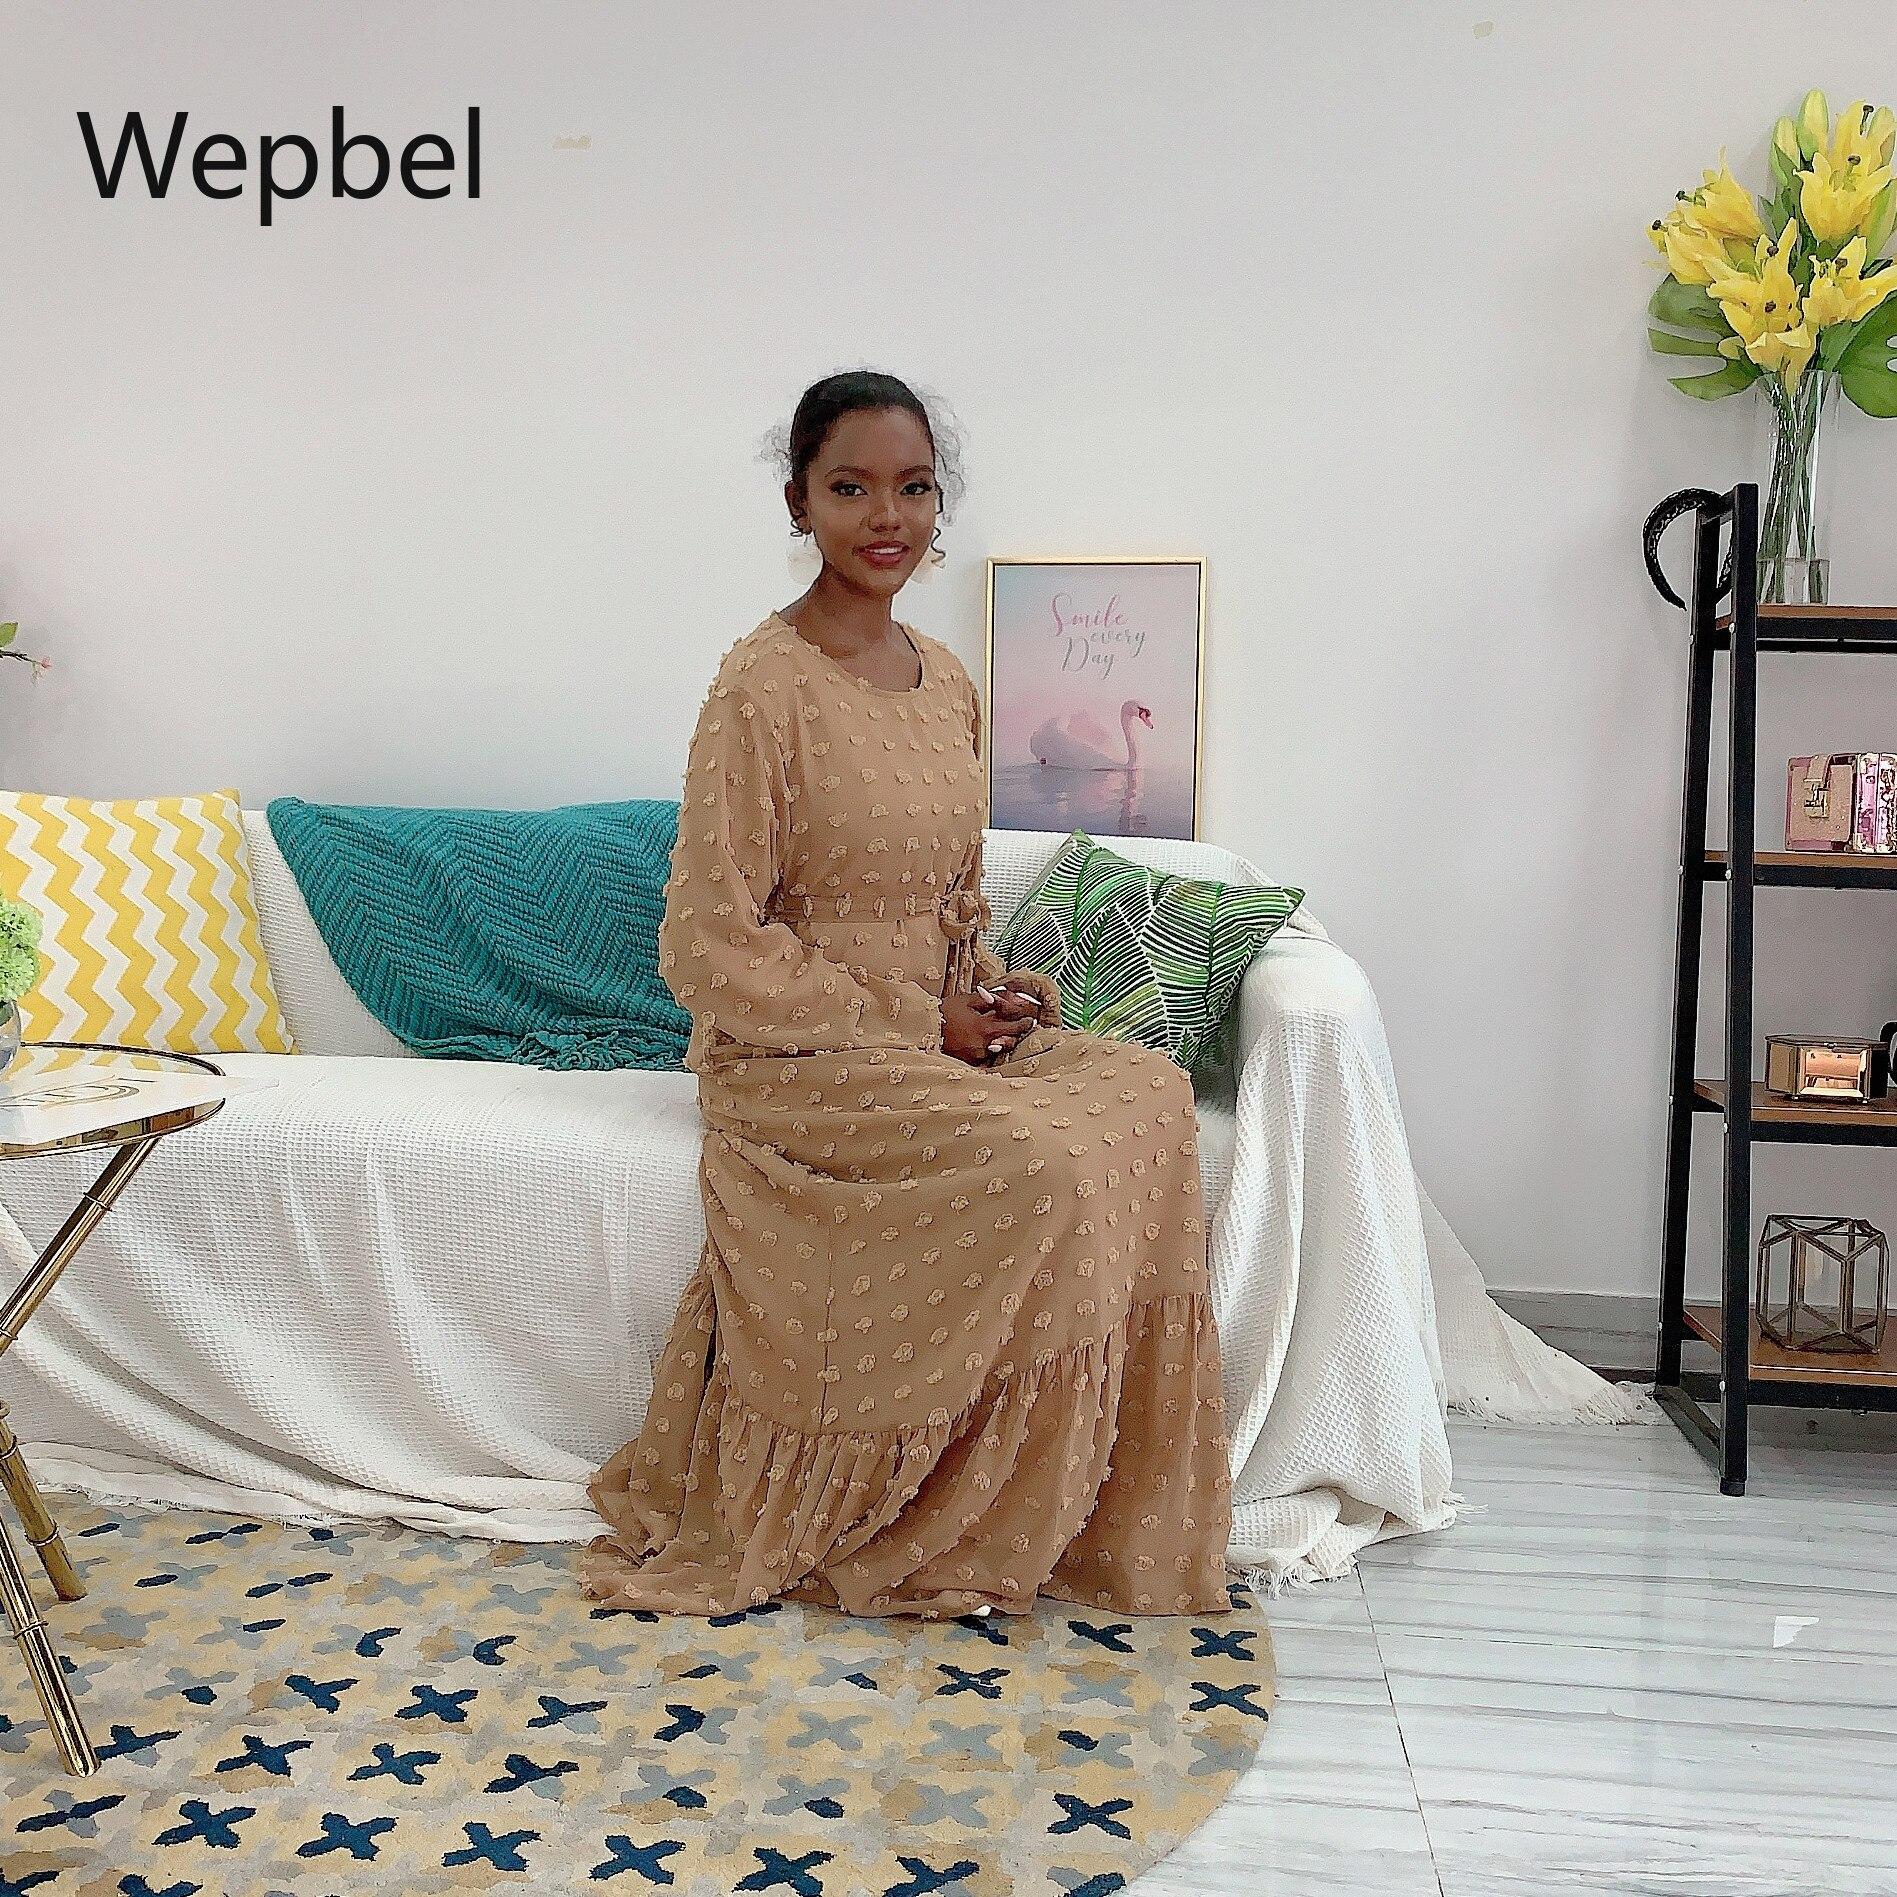 WEPBEL Muslim Women Dress Small Furry Ball Fashion Muslim Abaya Arab Duabai Plus Size High Waist O-neck Robe Gown Kimono